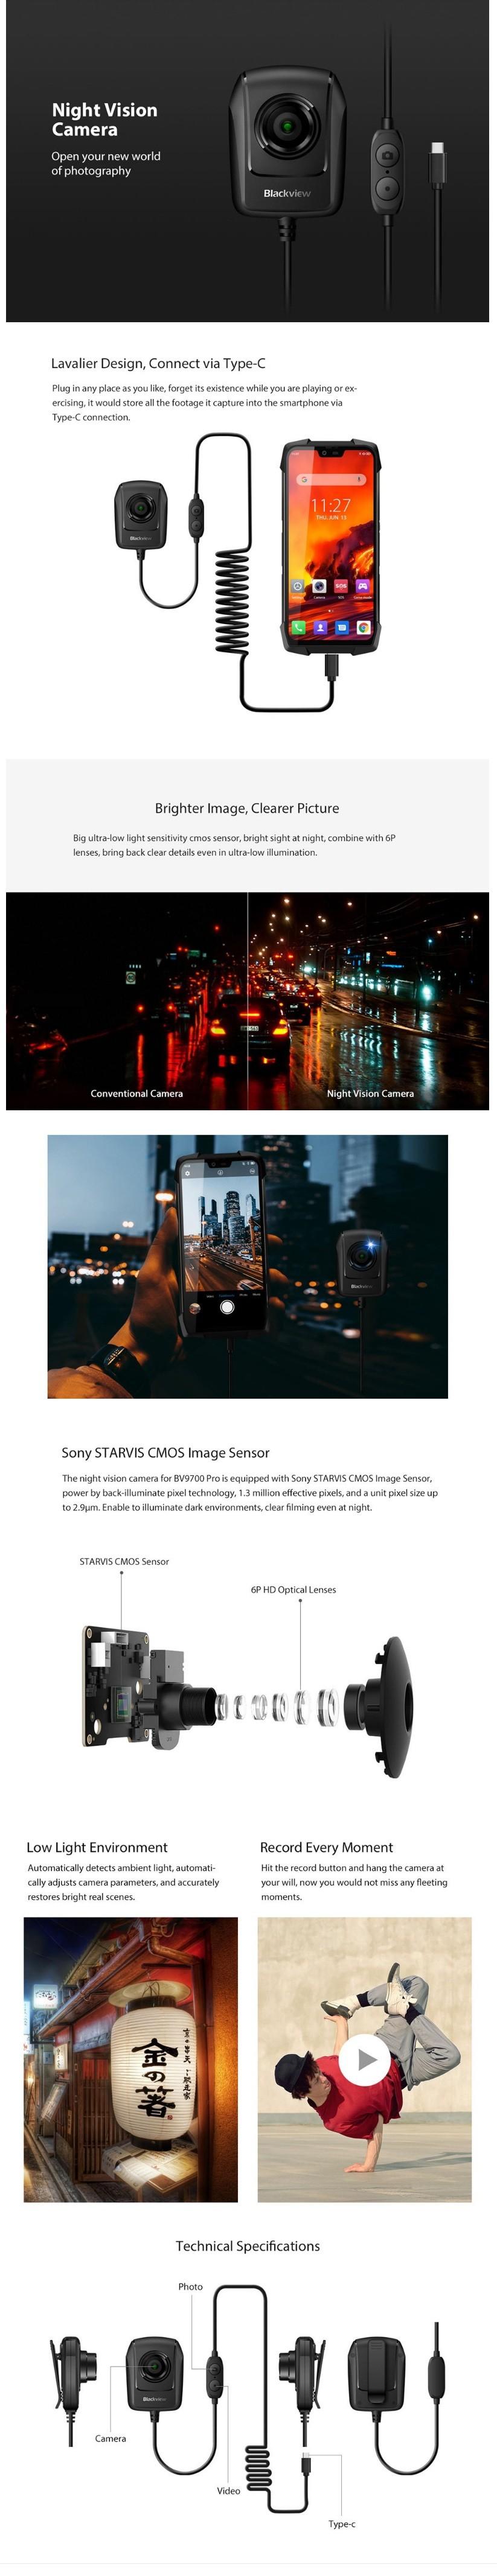 prezentare-night-vision-camera-pt-bv9700-pro81c8037d46f3b816.jpg